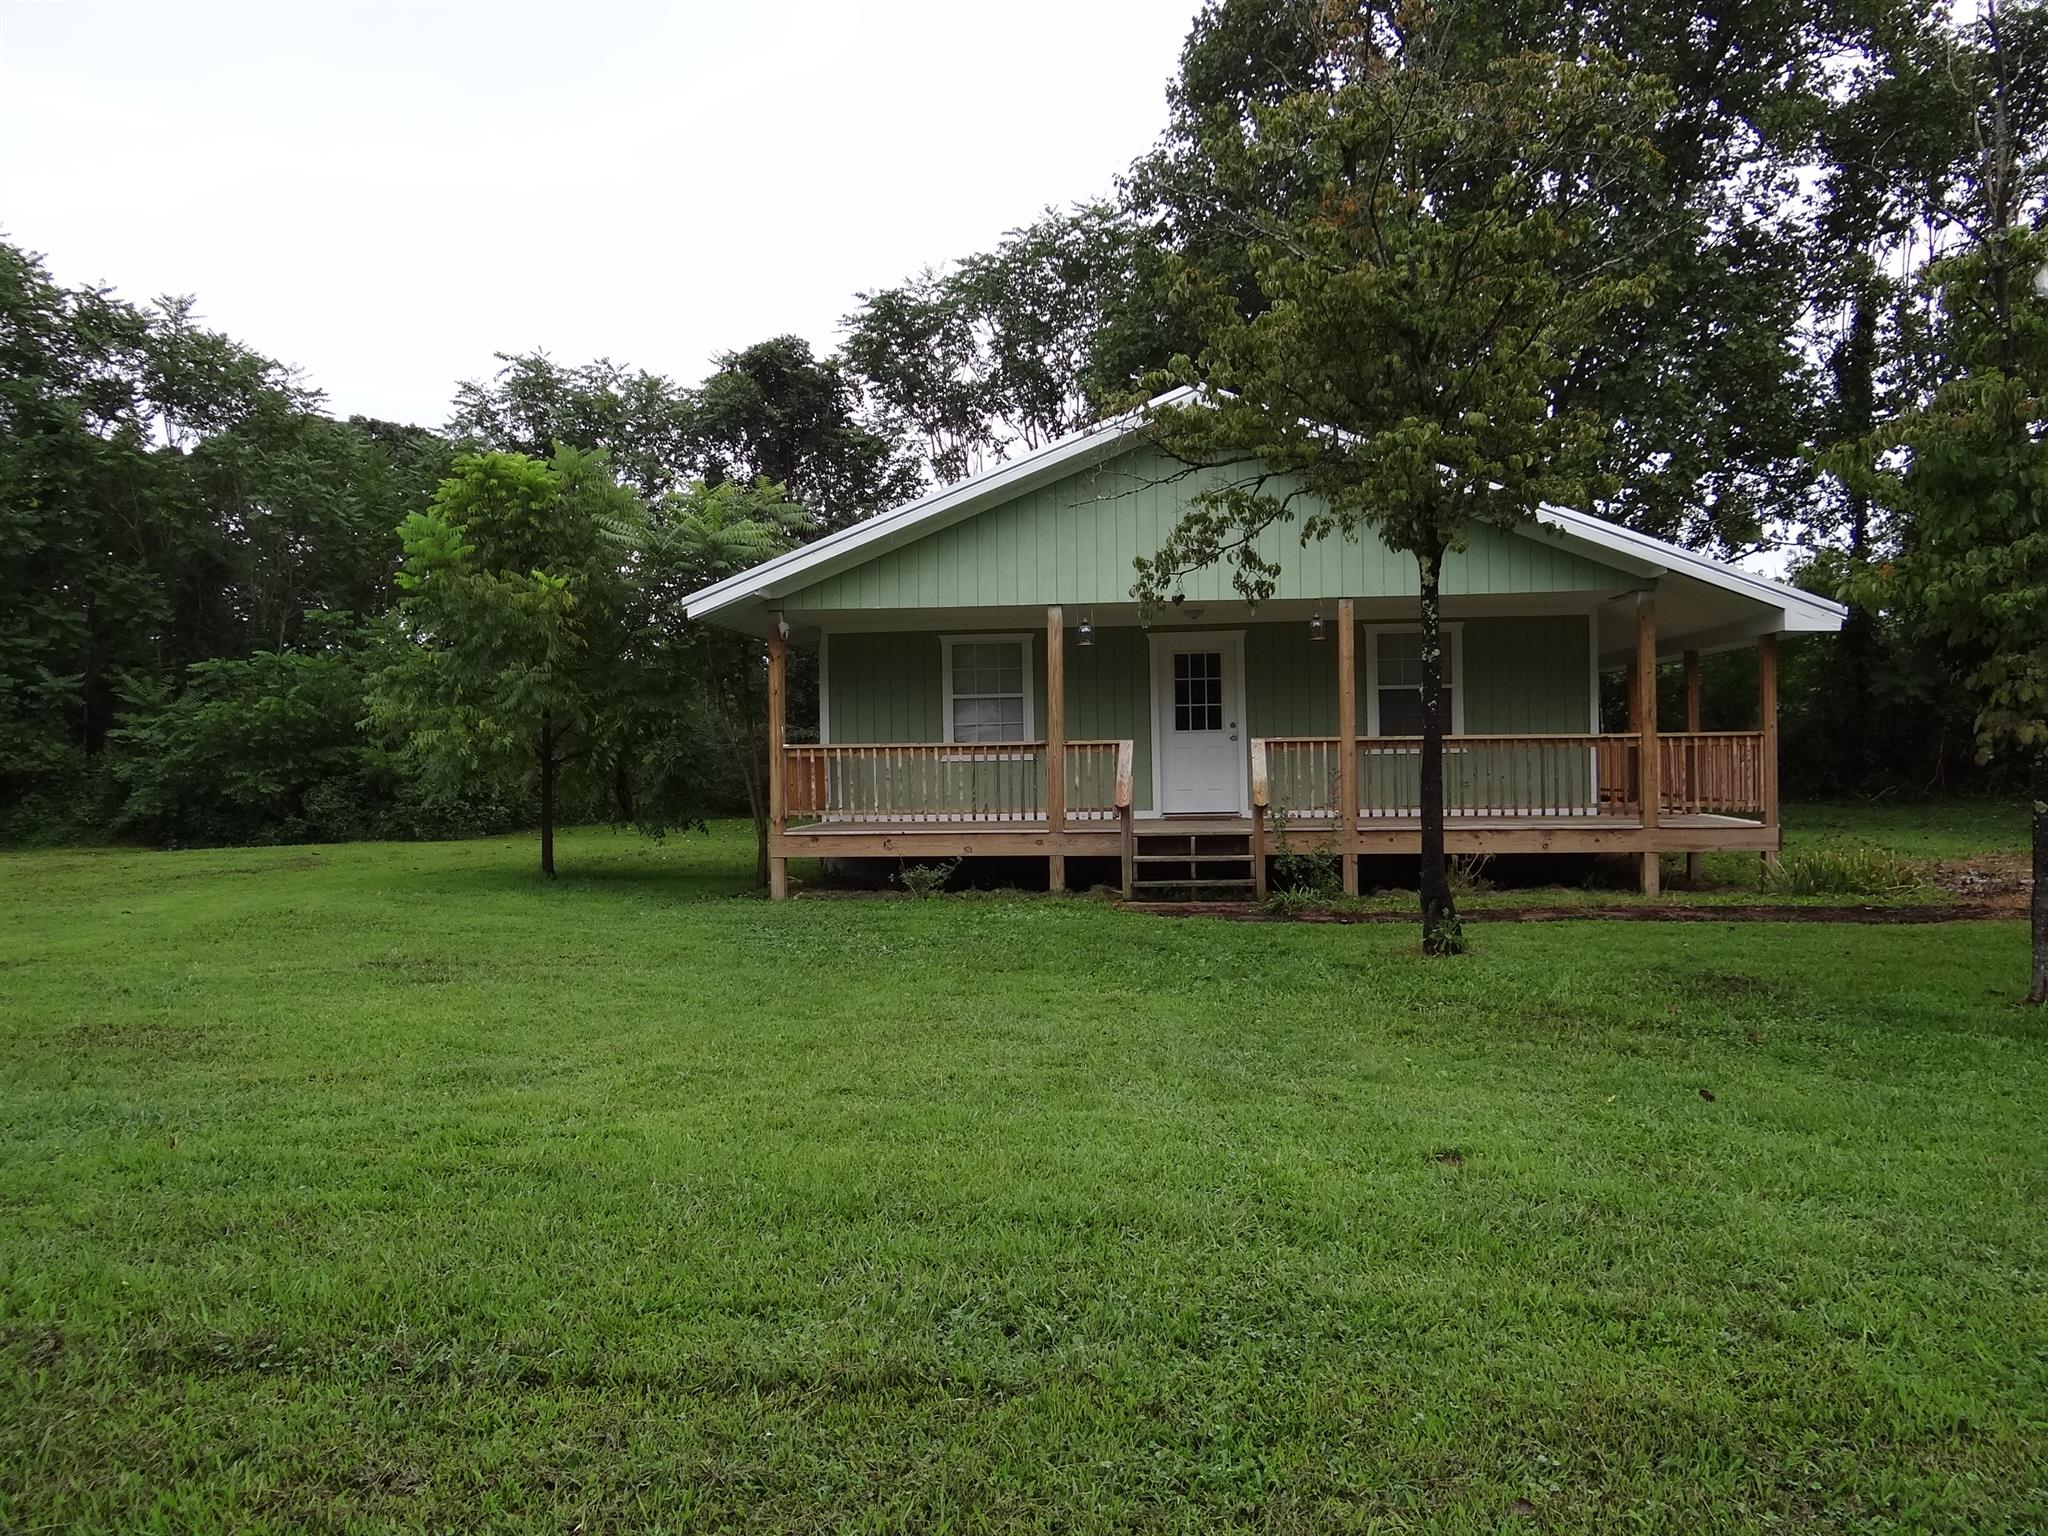 617 Doug Luna Rd, Walling, TN 38587 - Walling, TN real estate listing